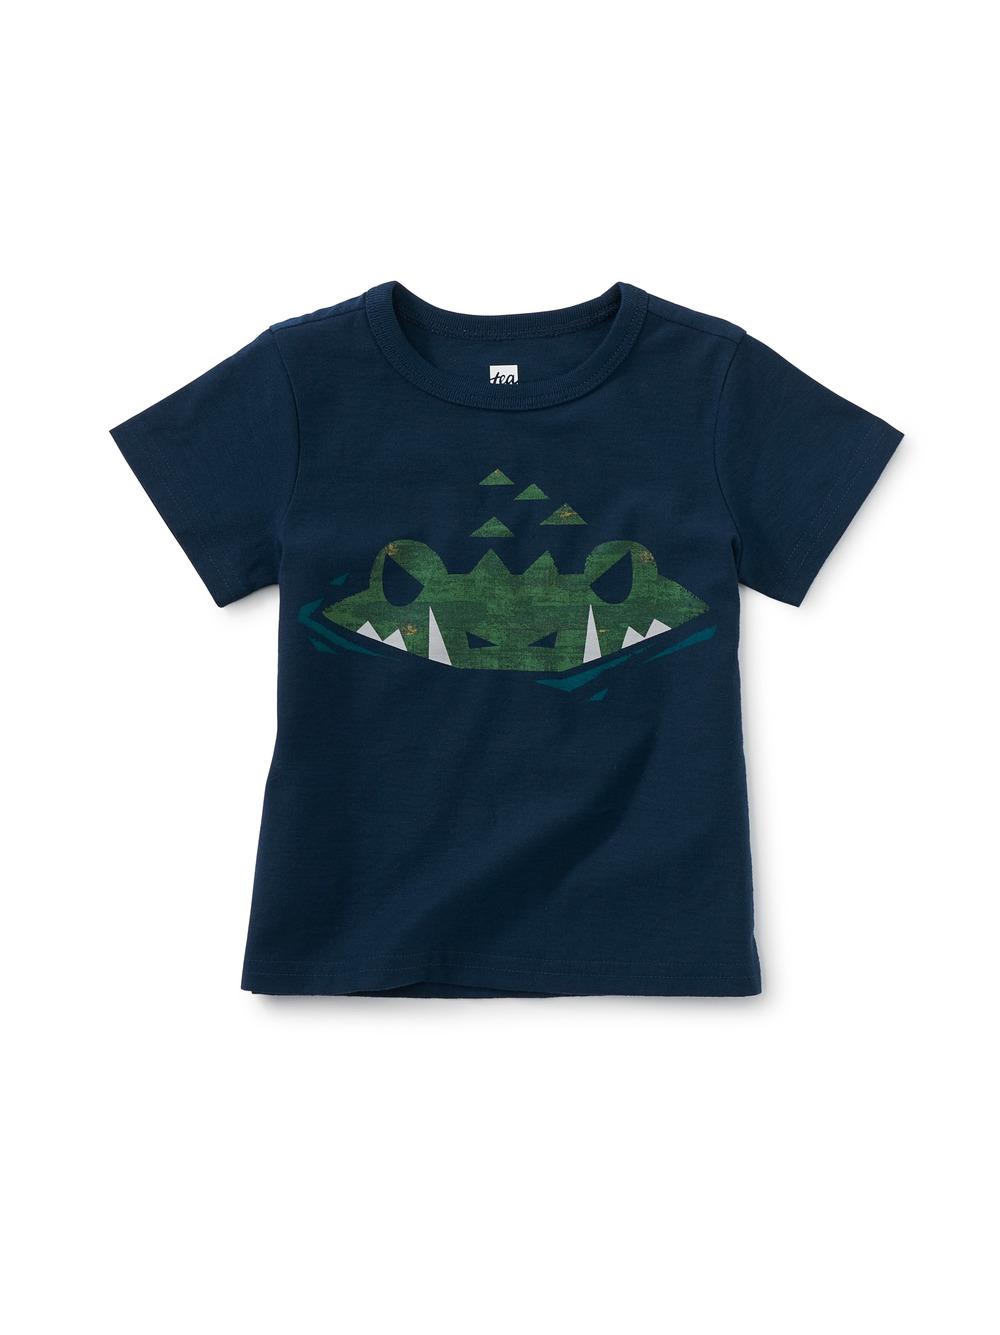 Crocodile Baby Graphic Tee